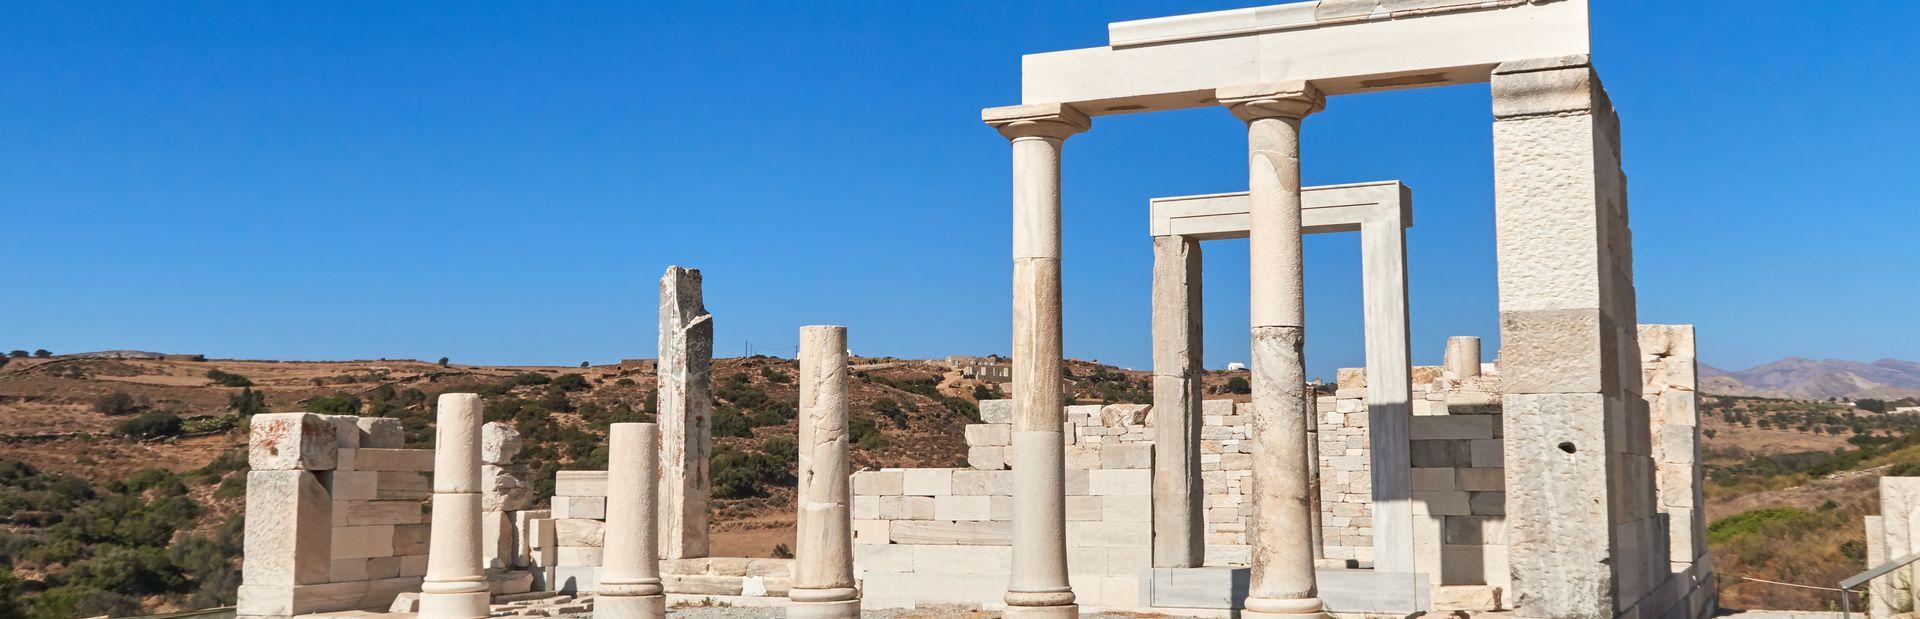 Temple of Demeter Image 1